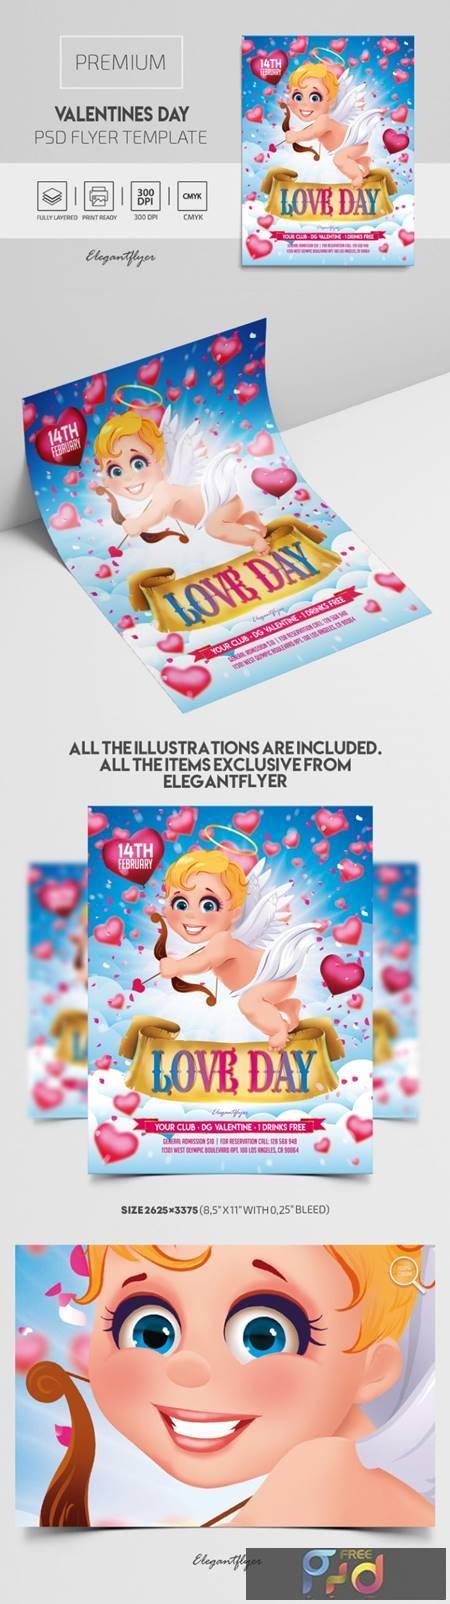 Valentines Day – Premium PSD Flyer Template 116484 1